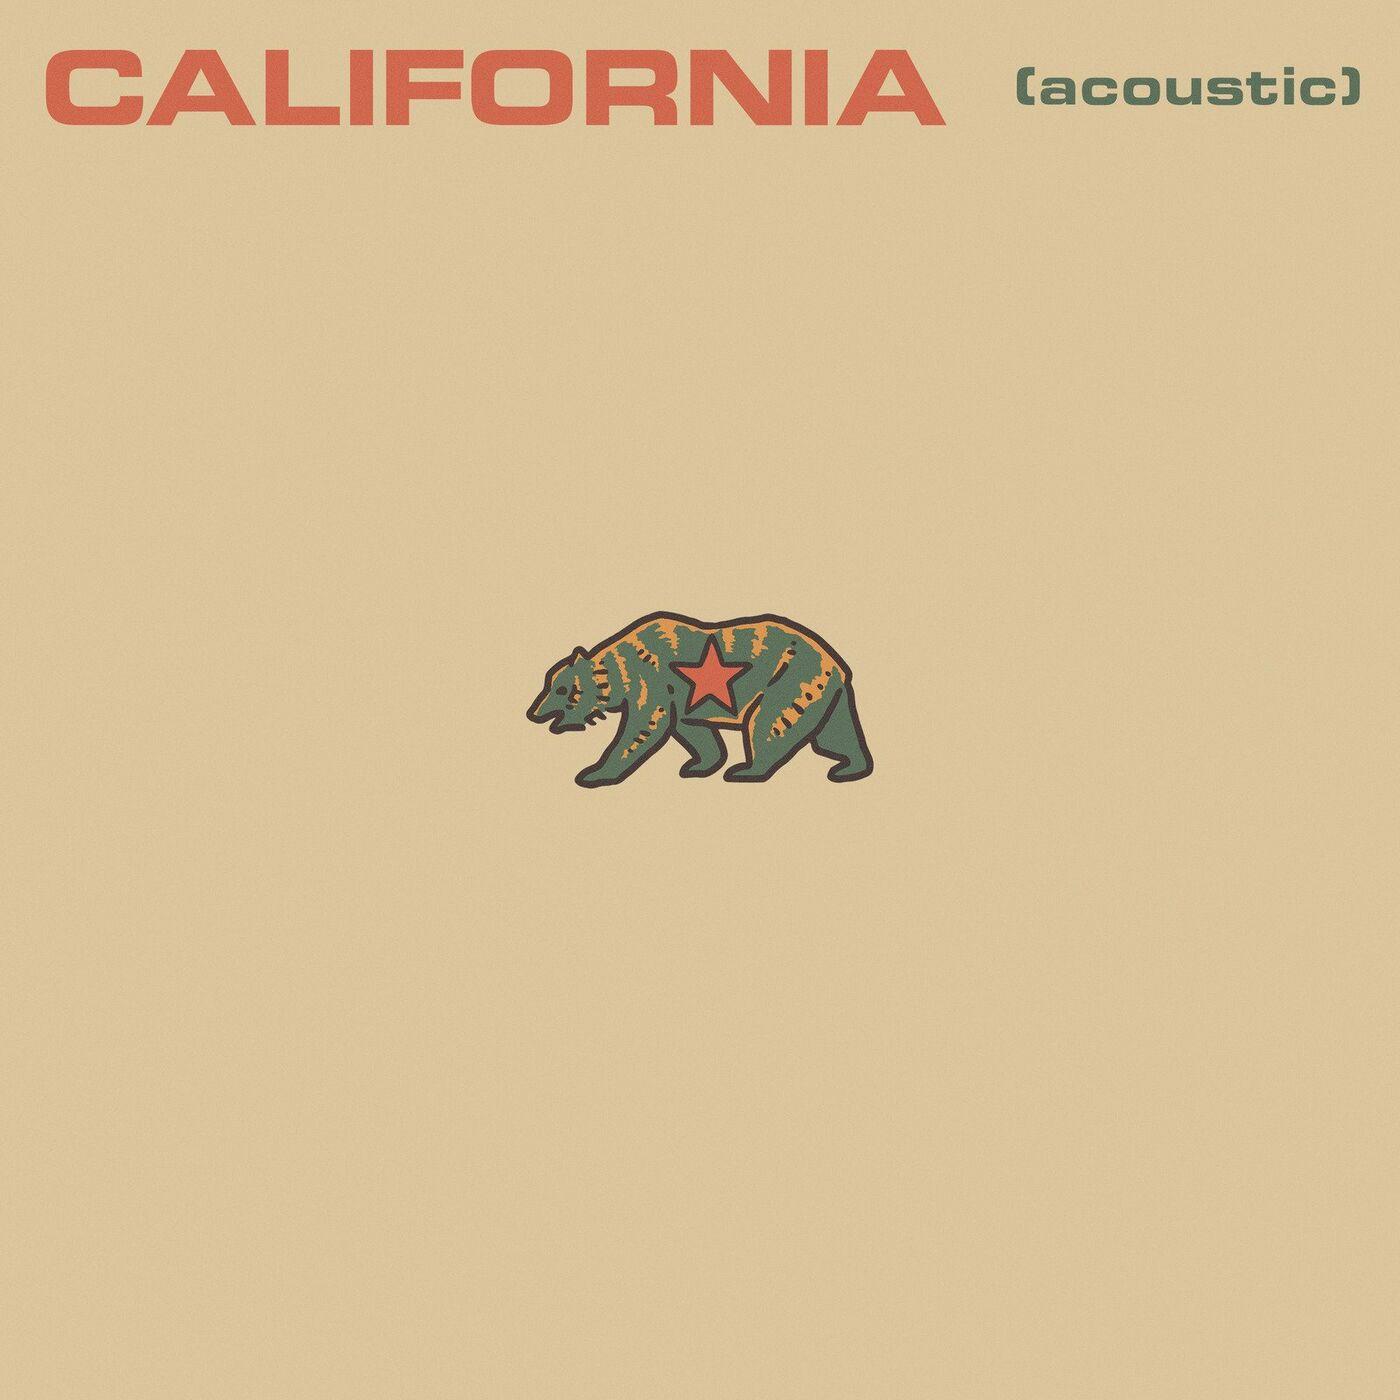 Silverstein - California (Acoustic) [single] (2020)